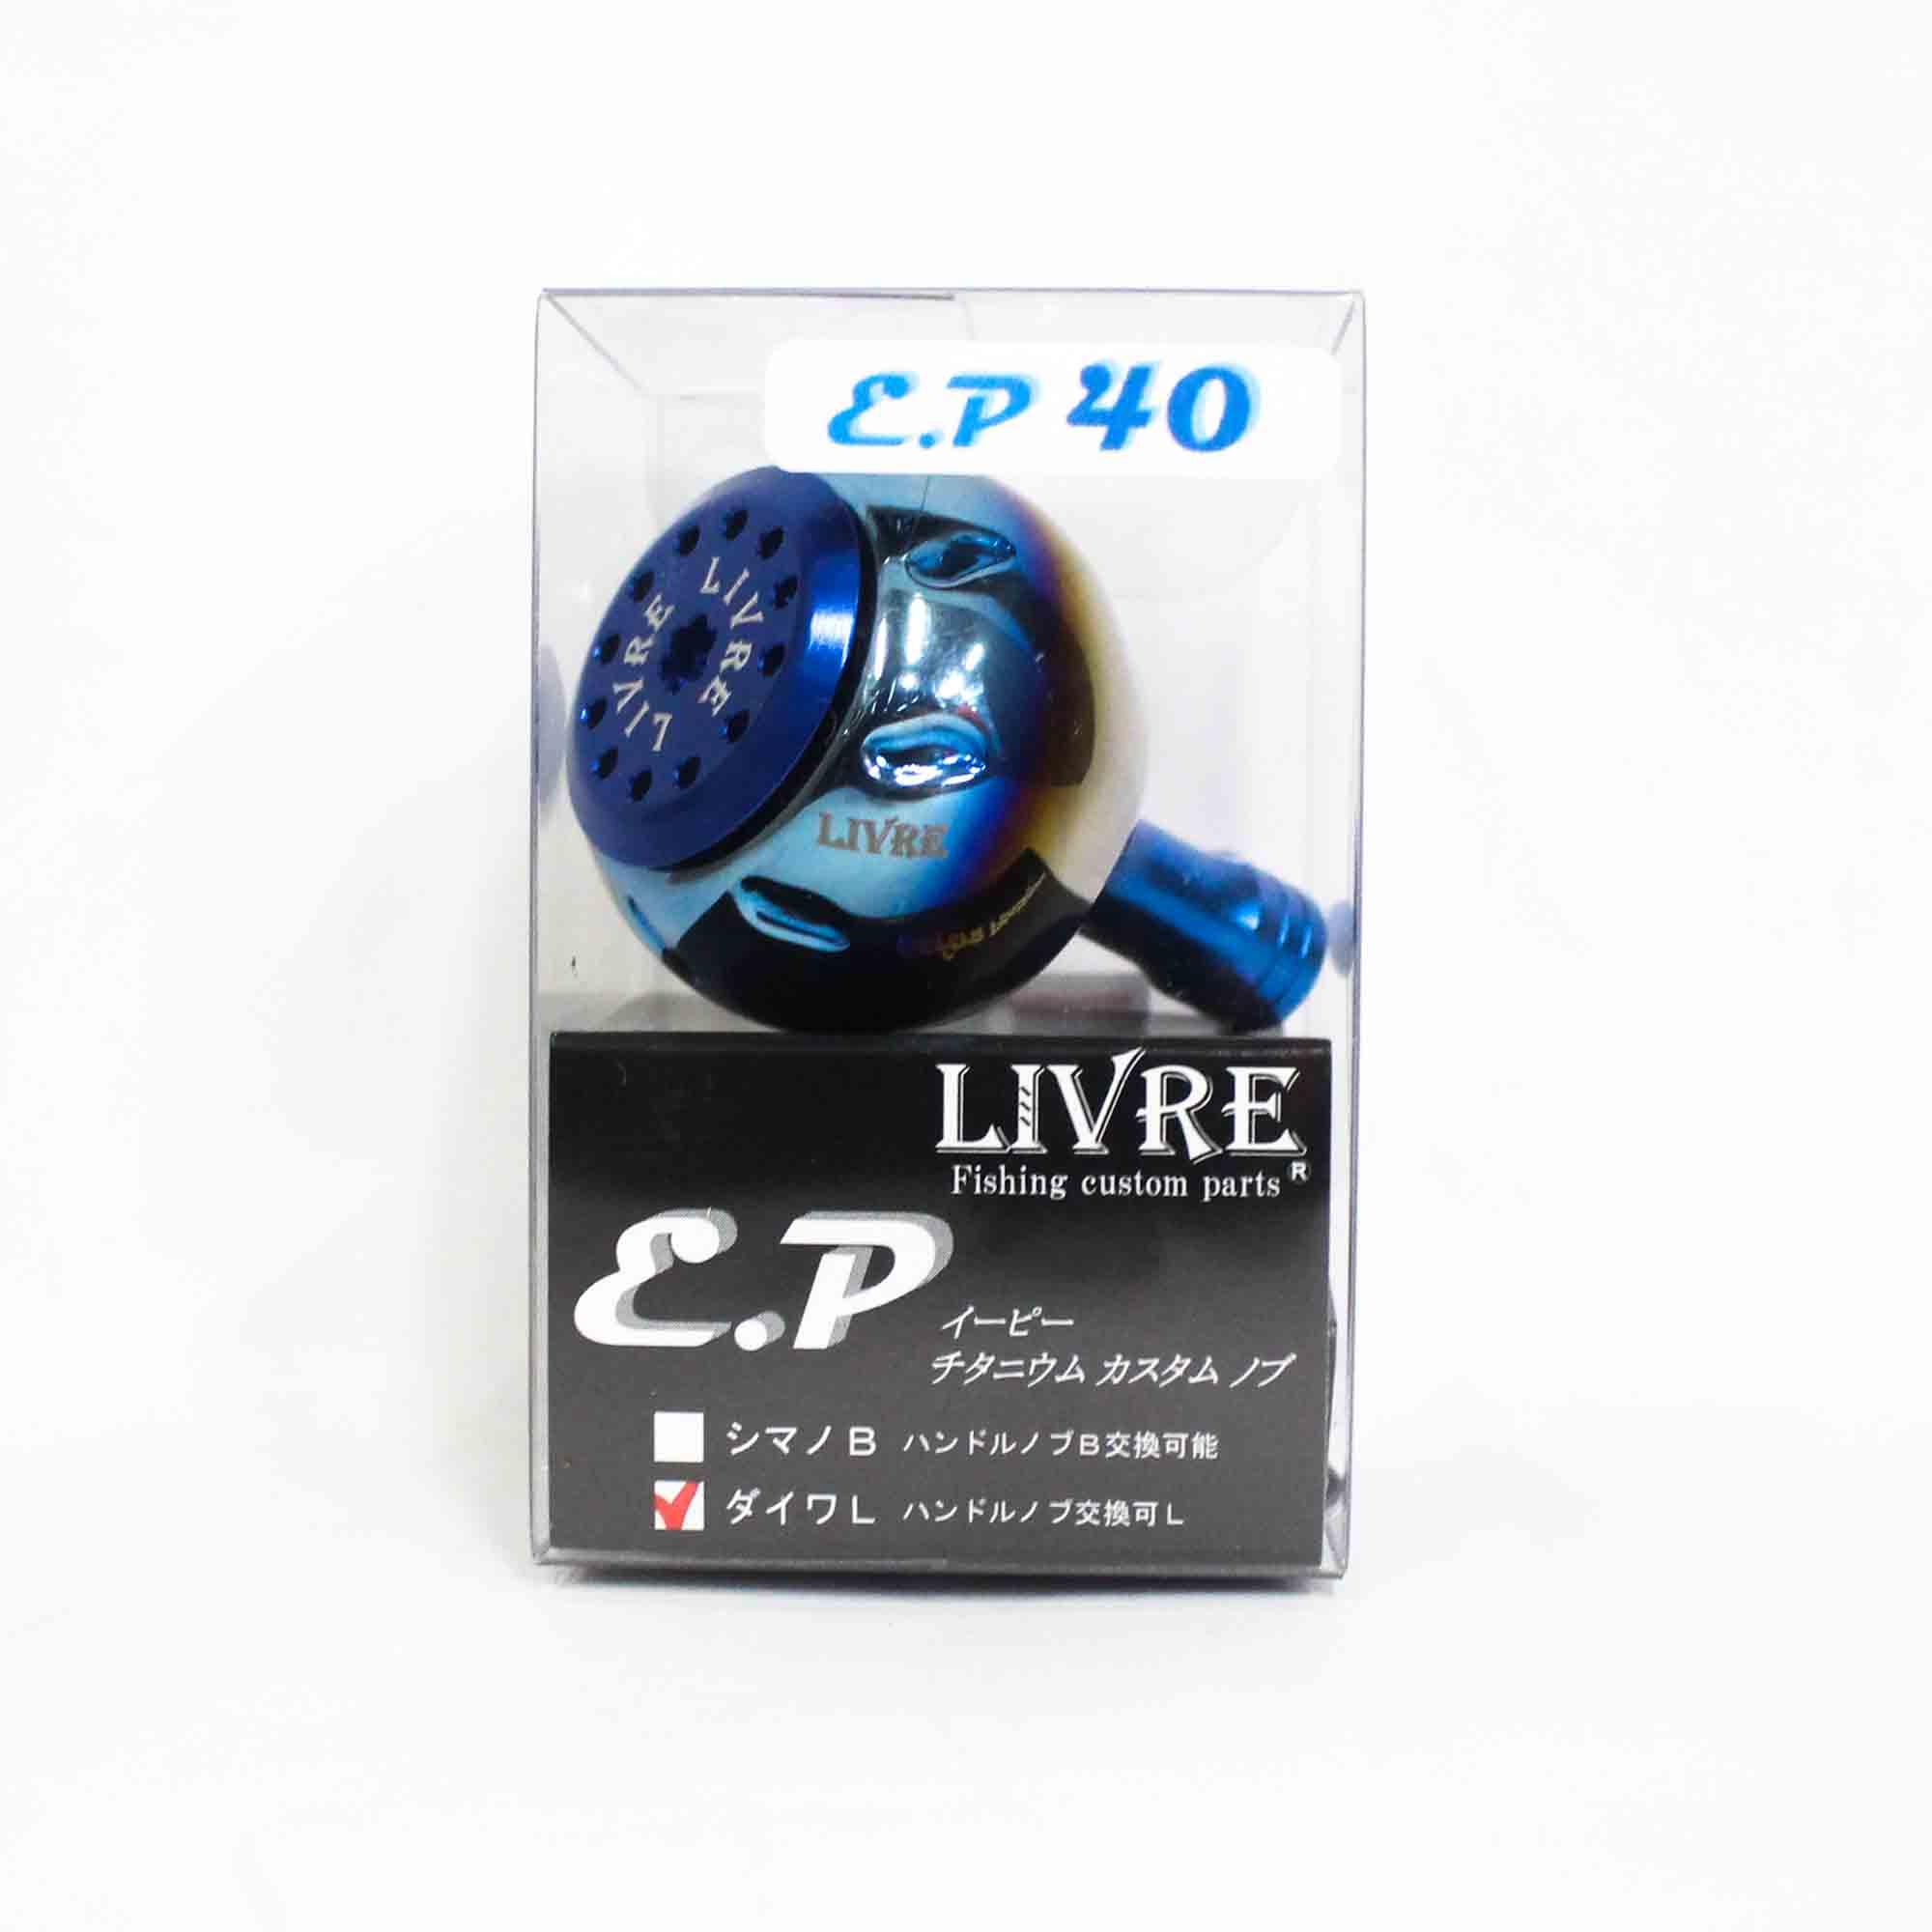 Livre E40LBL-1 Knob EP40 Shimano Daiwa (2578)